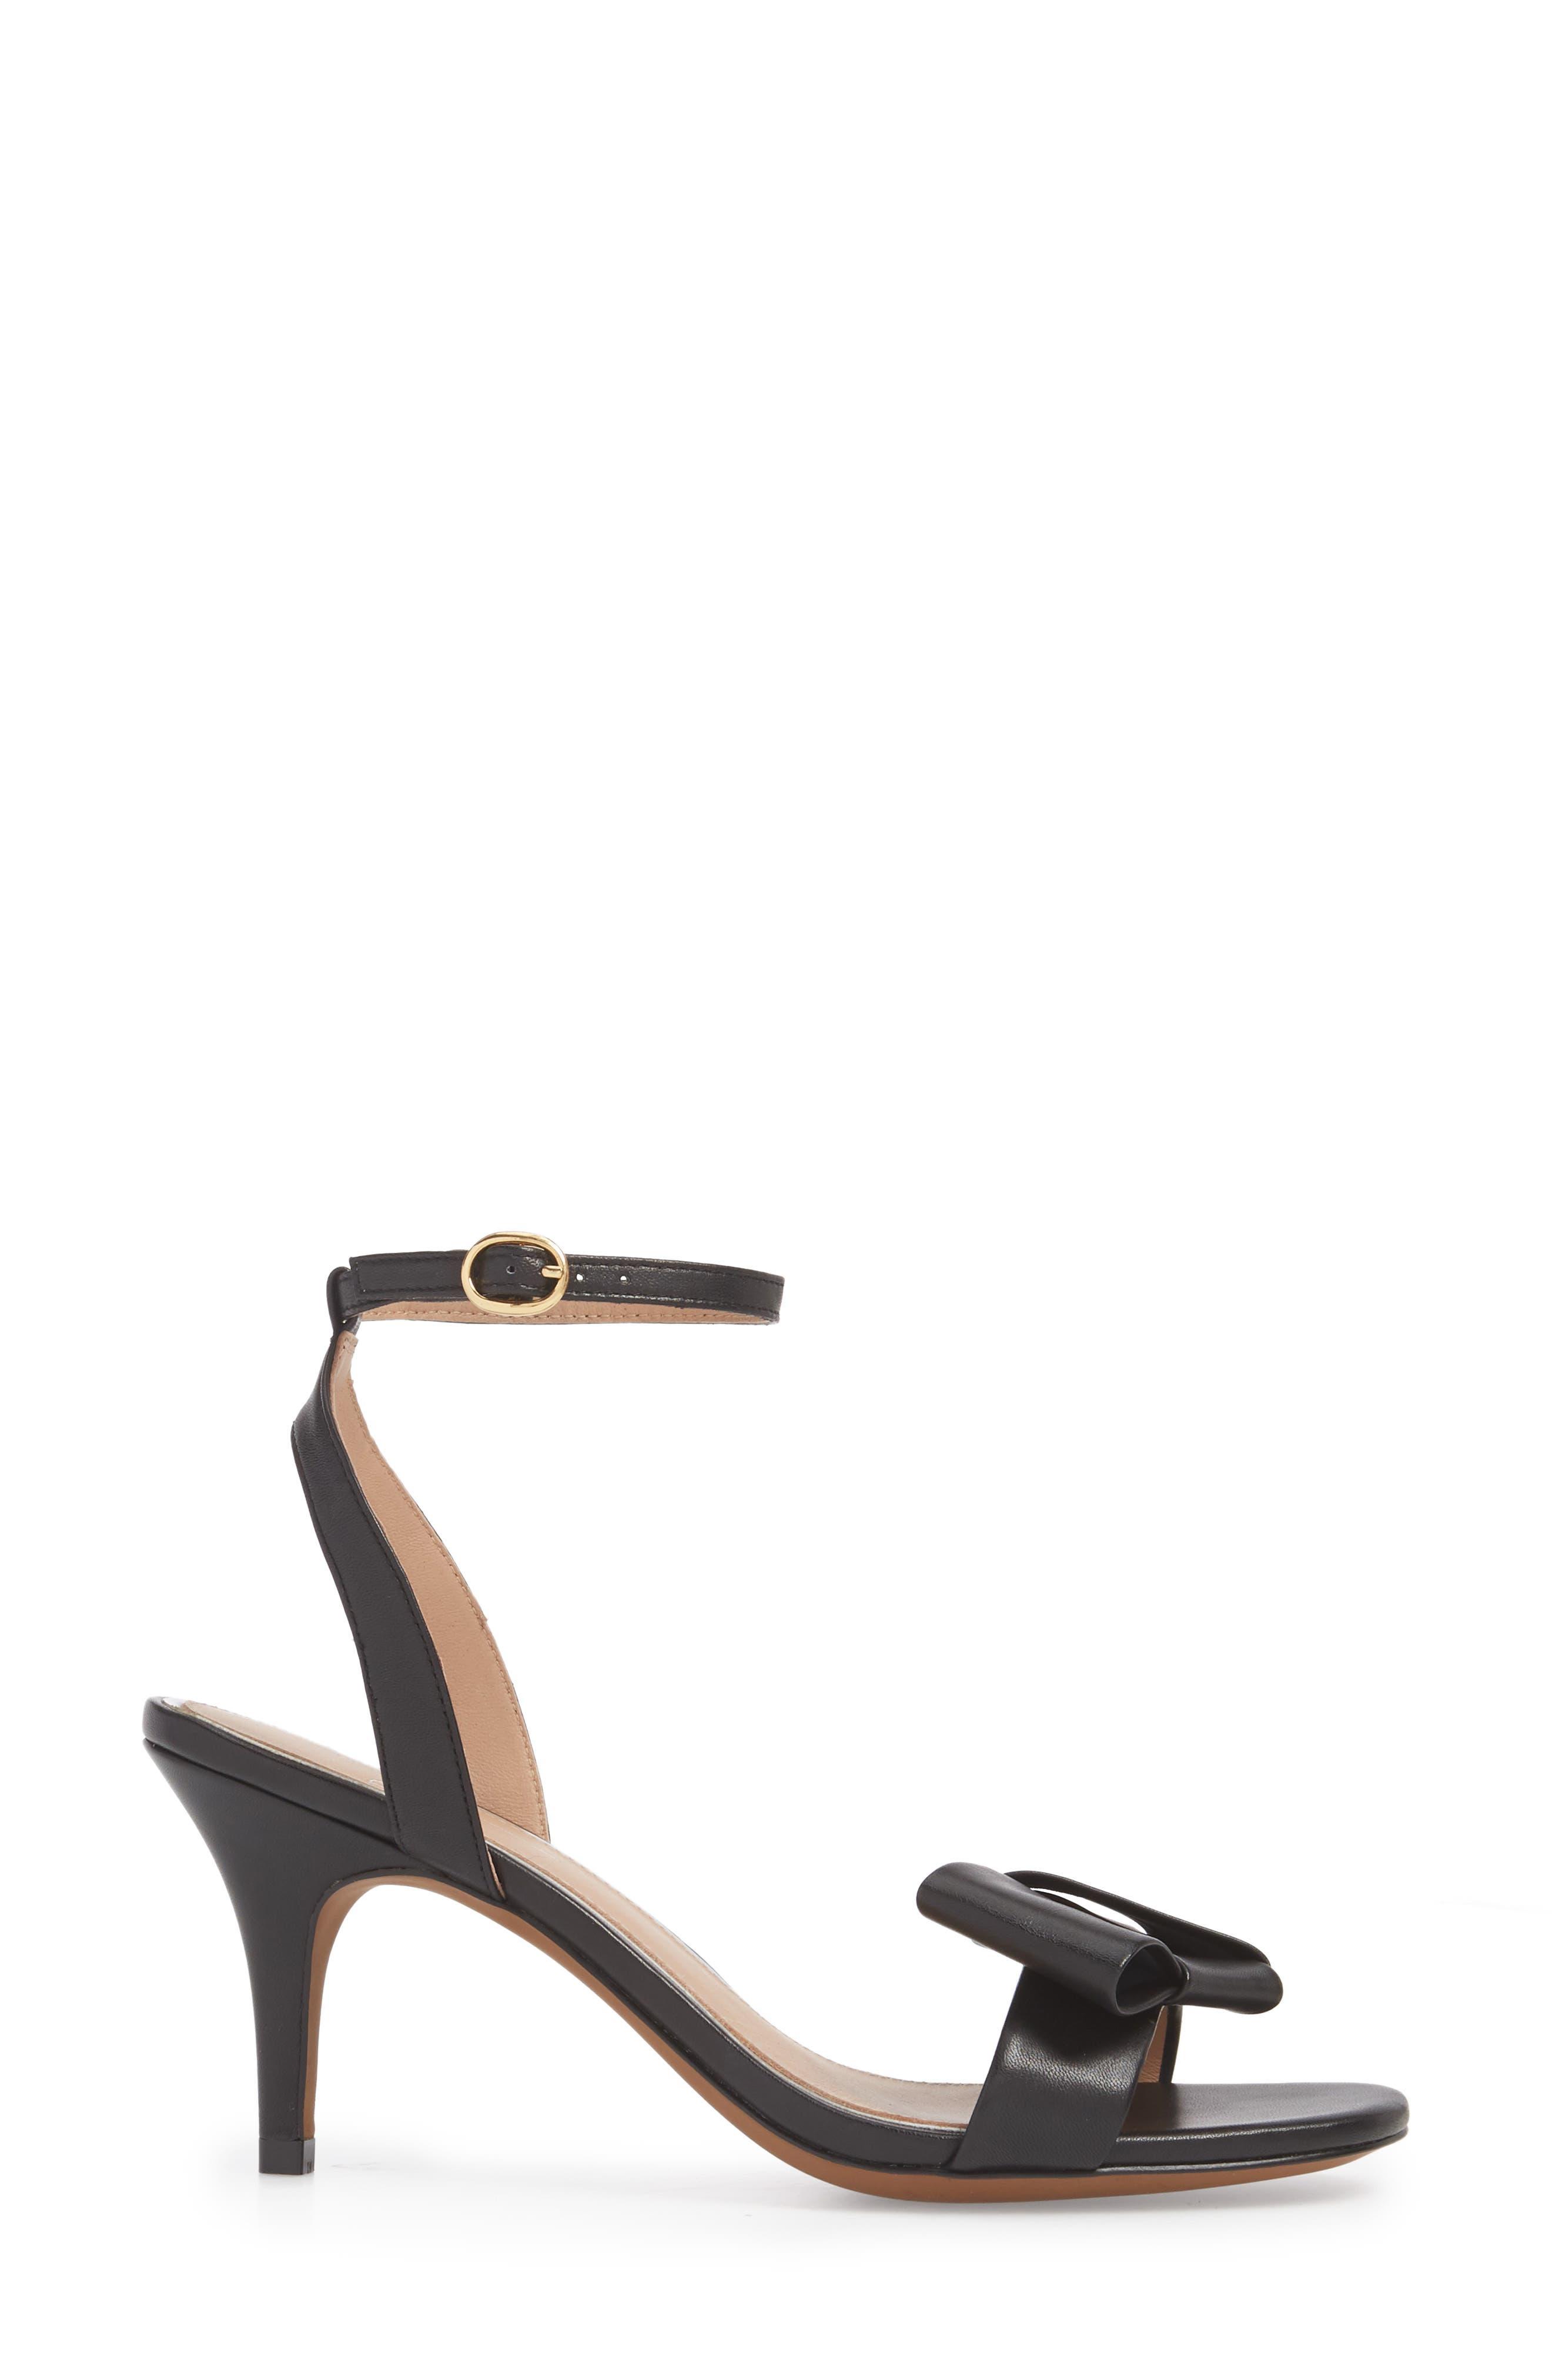 Haven Ankle Strap Sandal,                             Alternate thumbnail 3, color,                             BLACK LEATHER